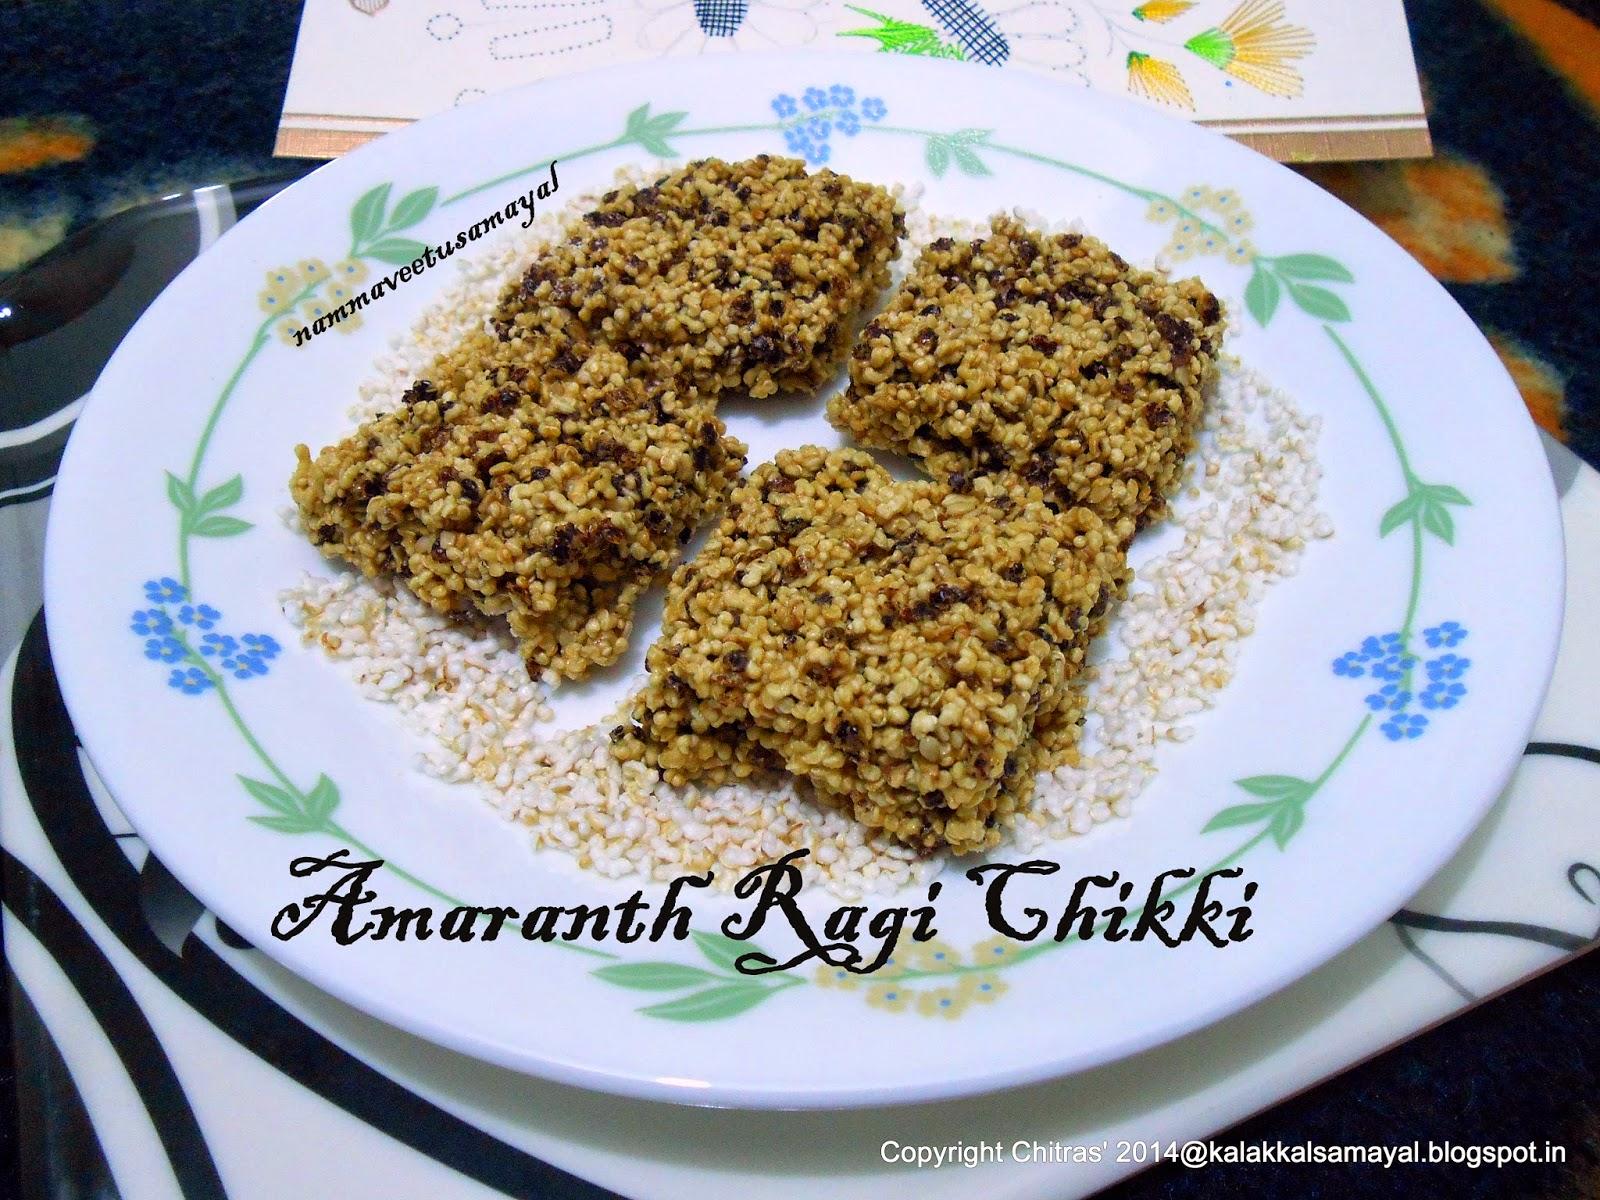 Amaranth Ragi Chikki